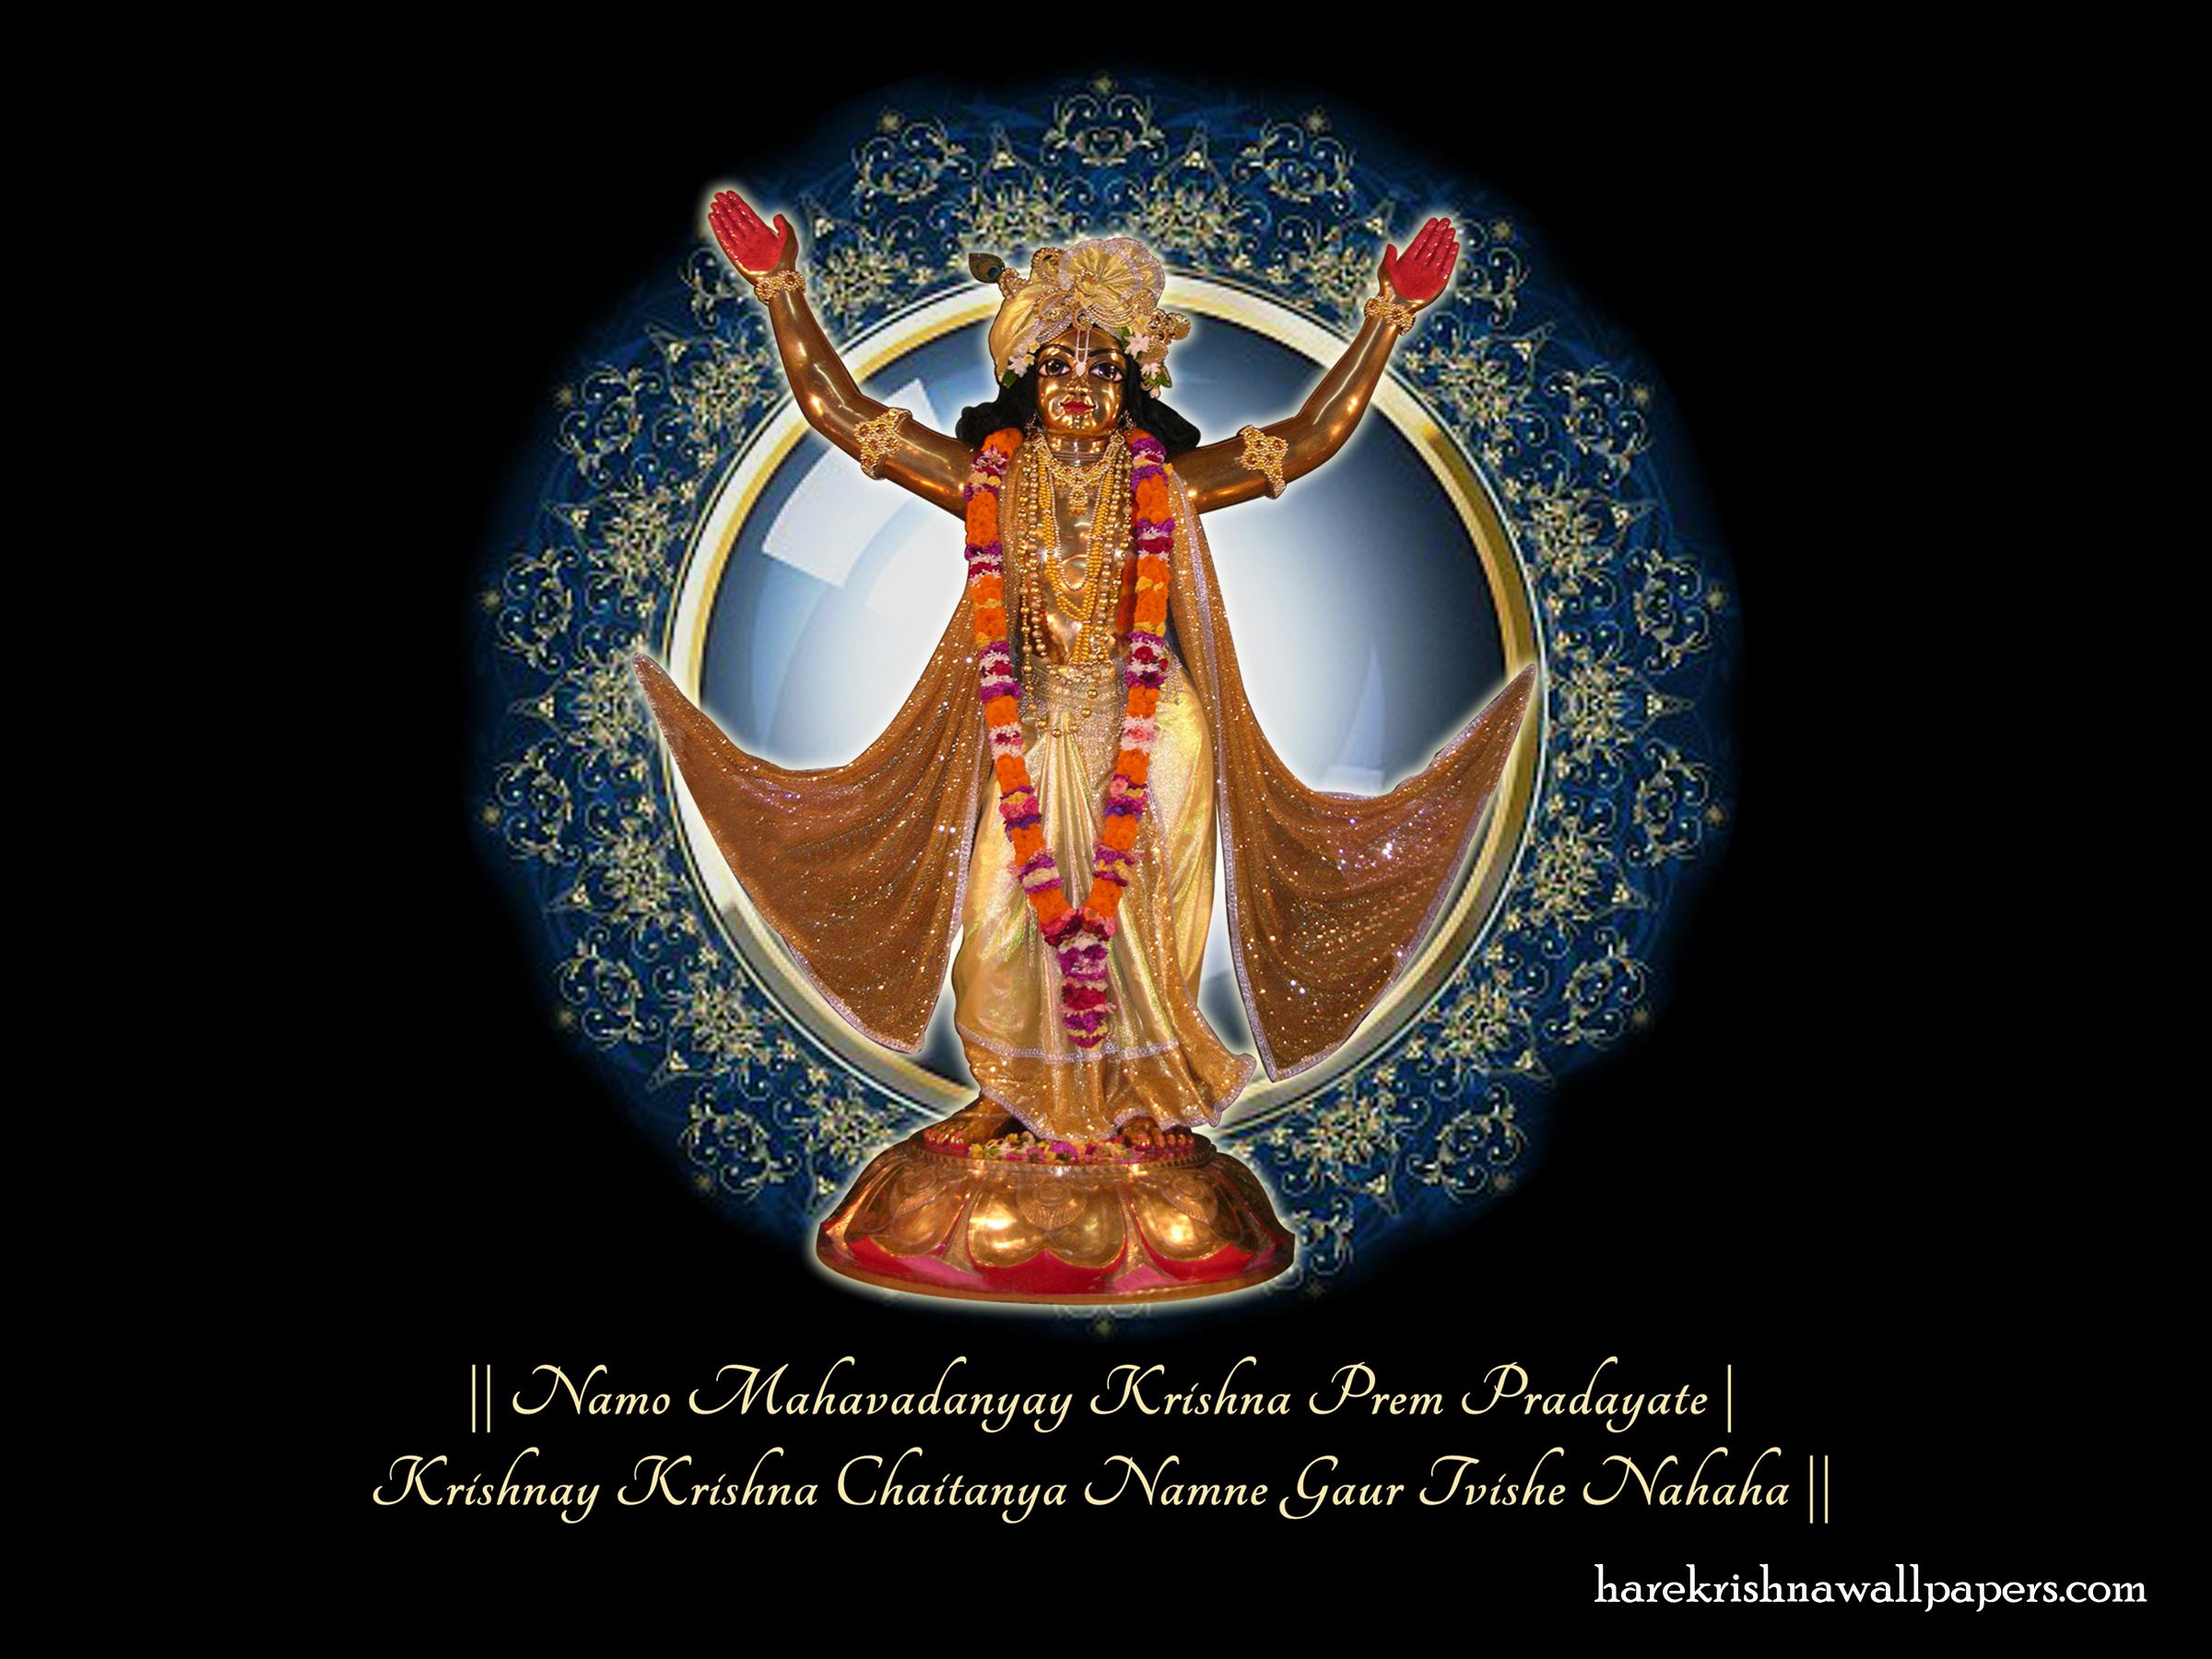 Chaitanya Mahaprabhu Wallpaper (001) Size 2400x1800 Download